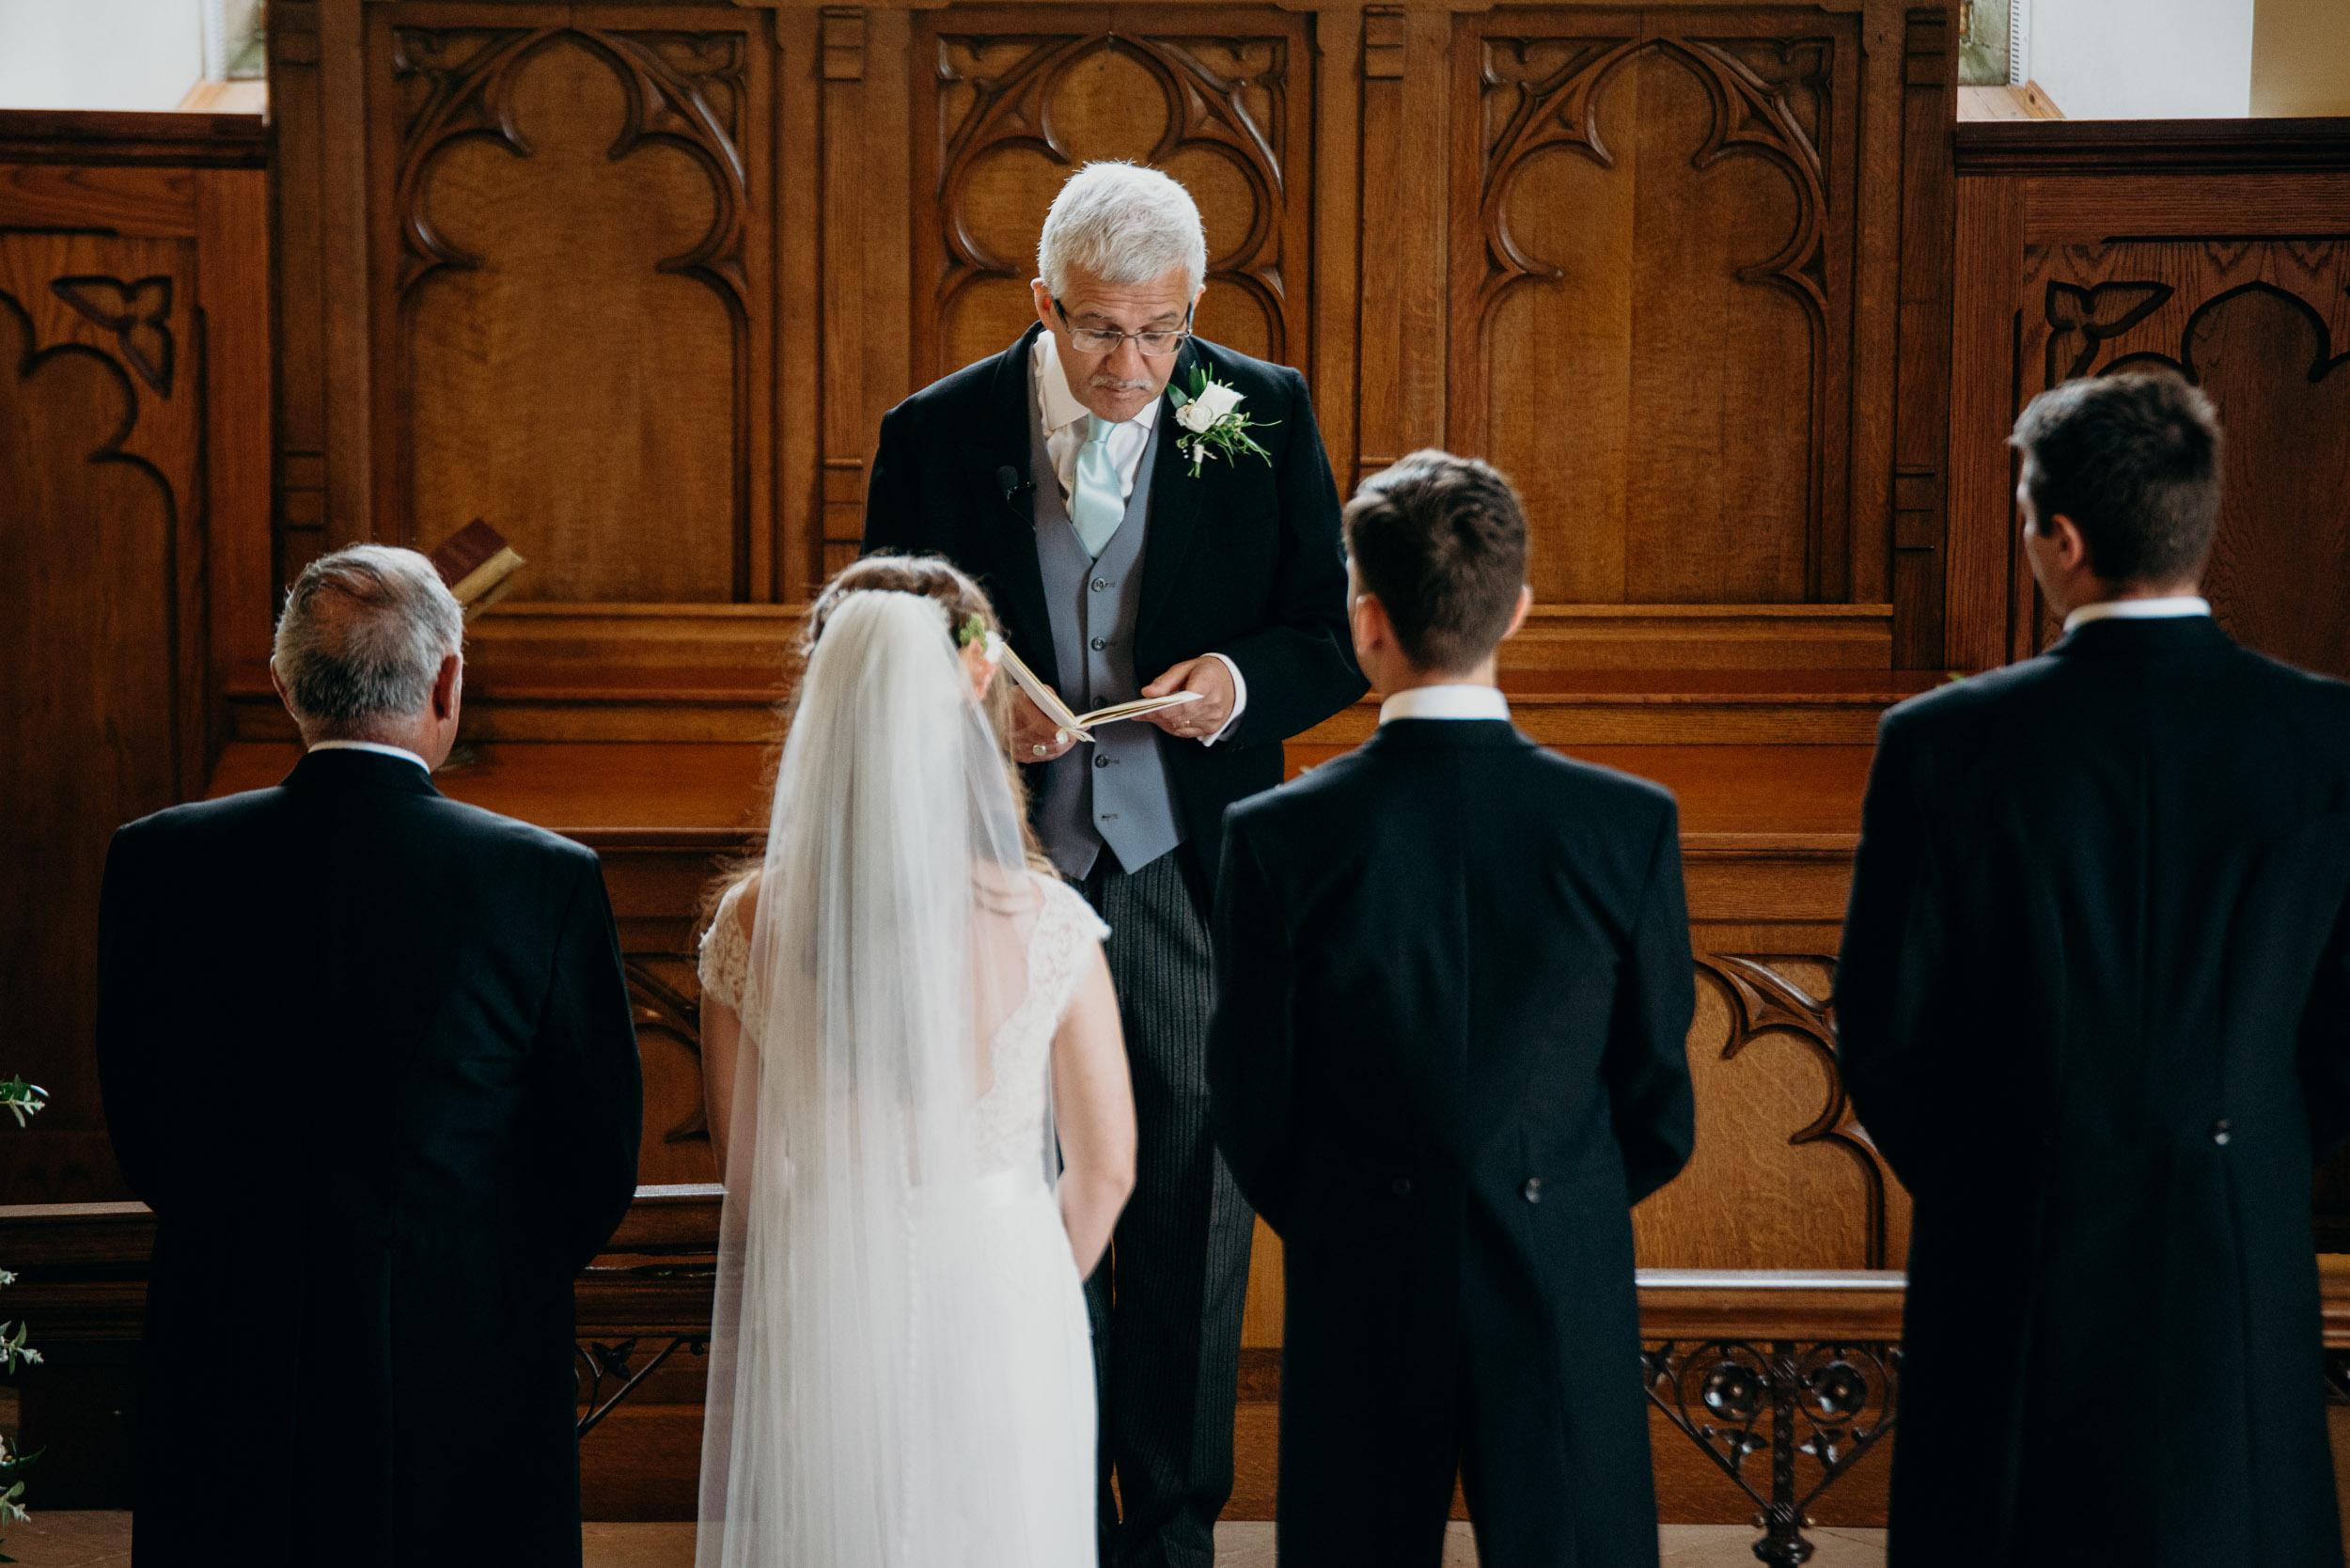 drenagh estate wedding photography-47.jpg